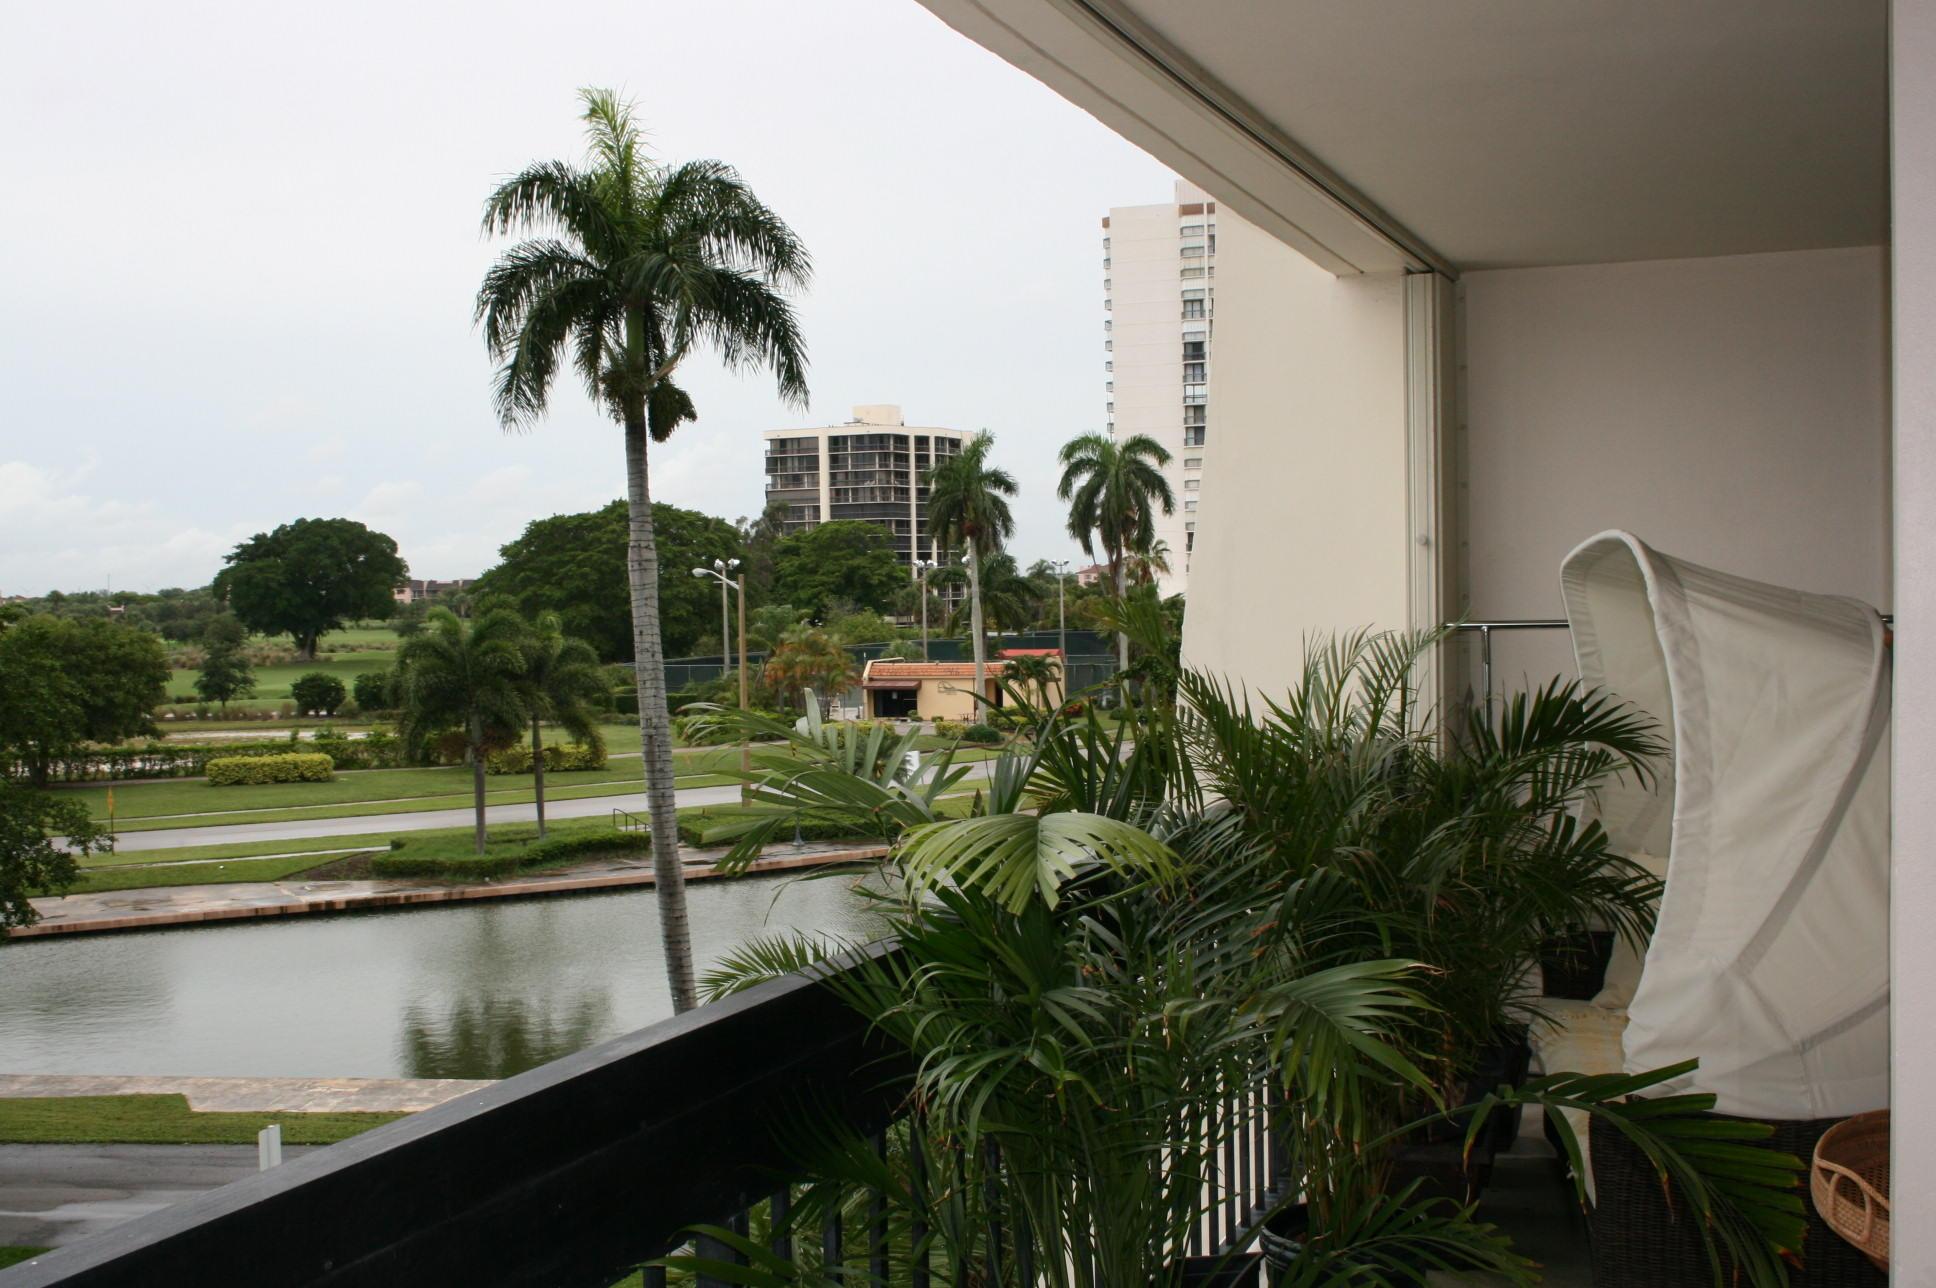 2000 Presidential Way 305 West Palm Beach, FL 33401